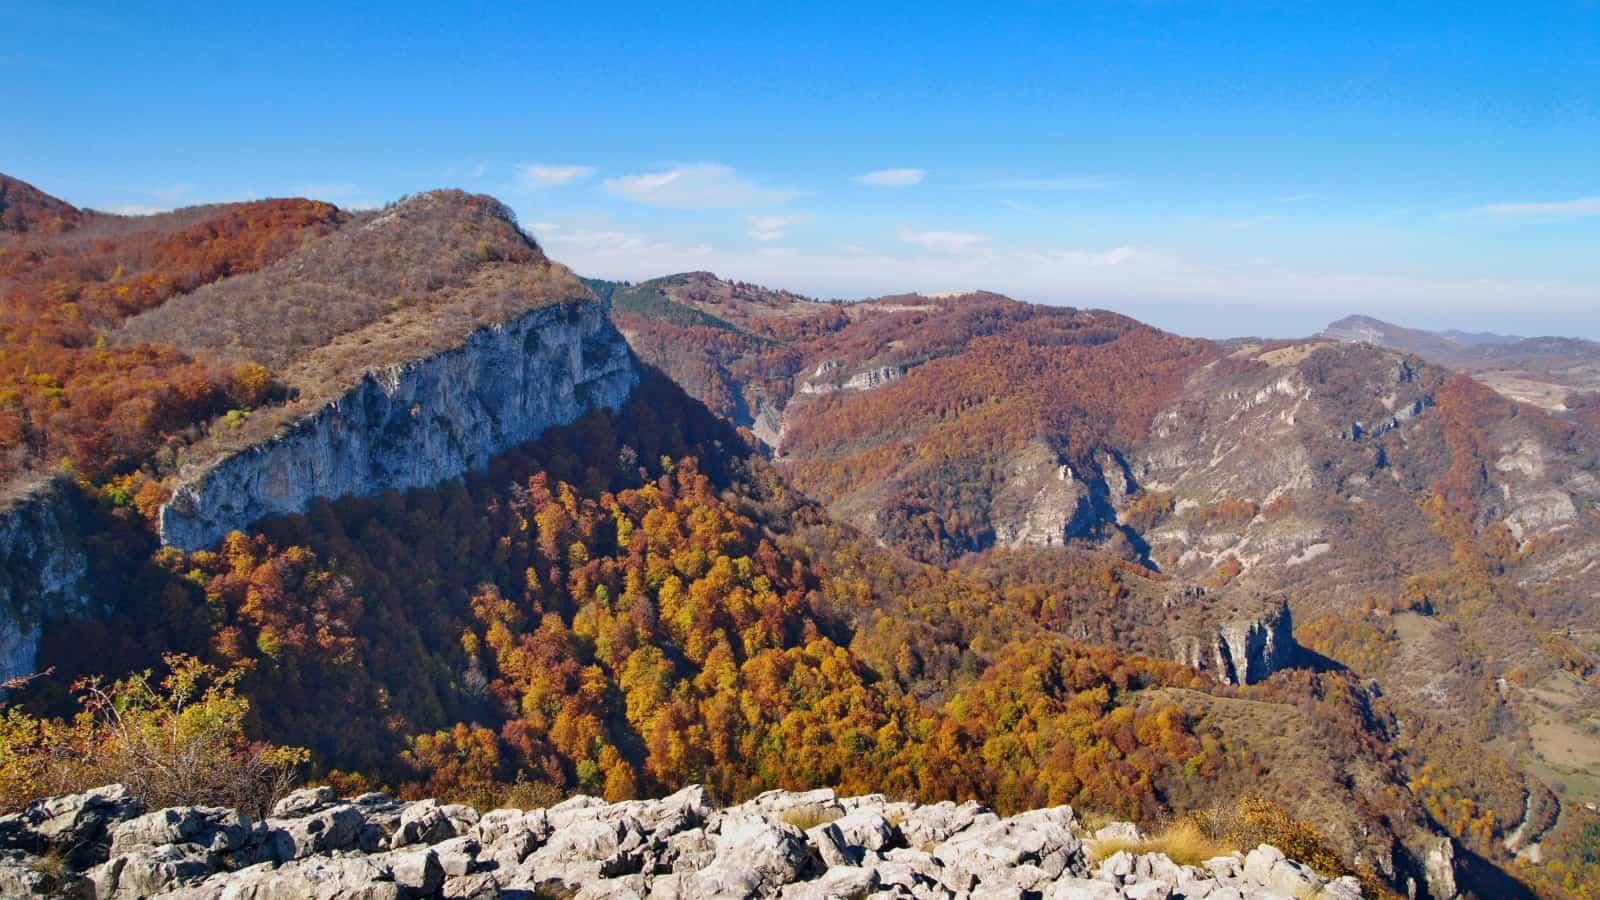 Karst-Tour - Aussicht am Wegesrand - Foto: Naturpark Vachranski Balkan/Krasimir Lakovski